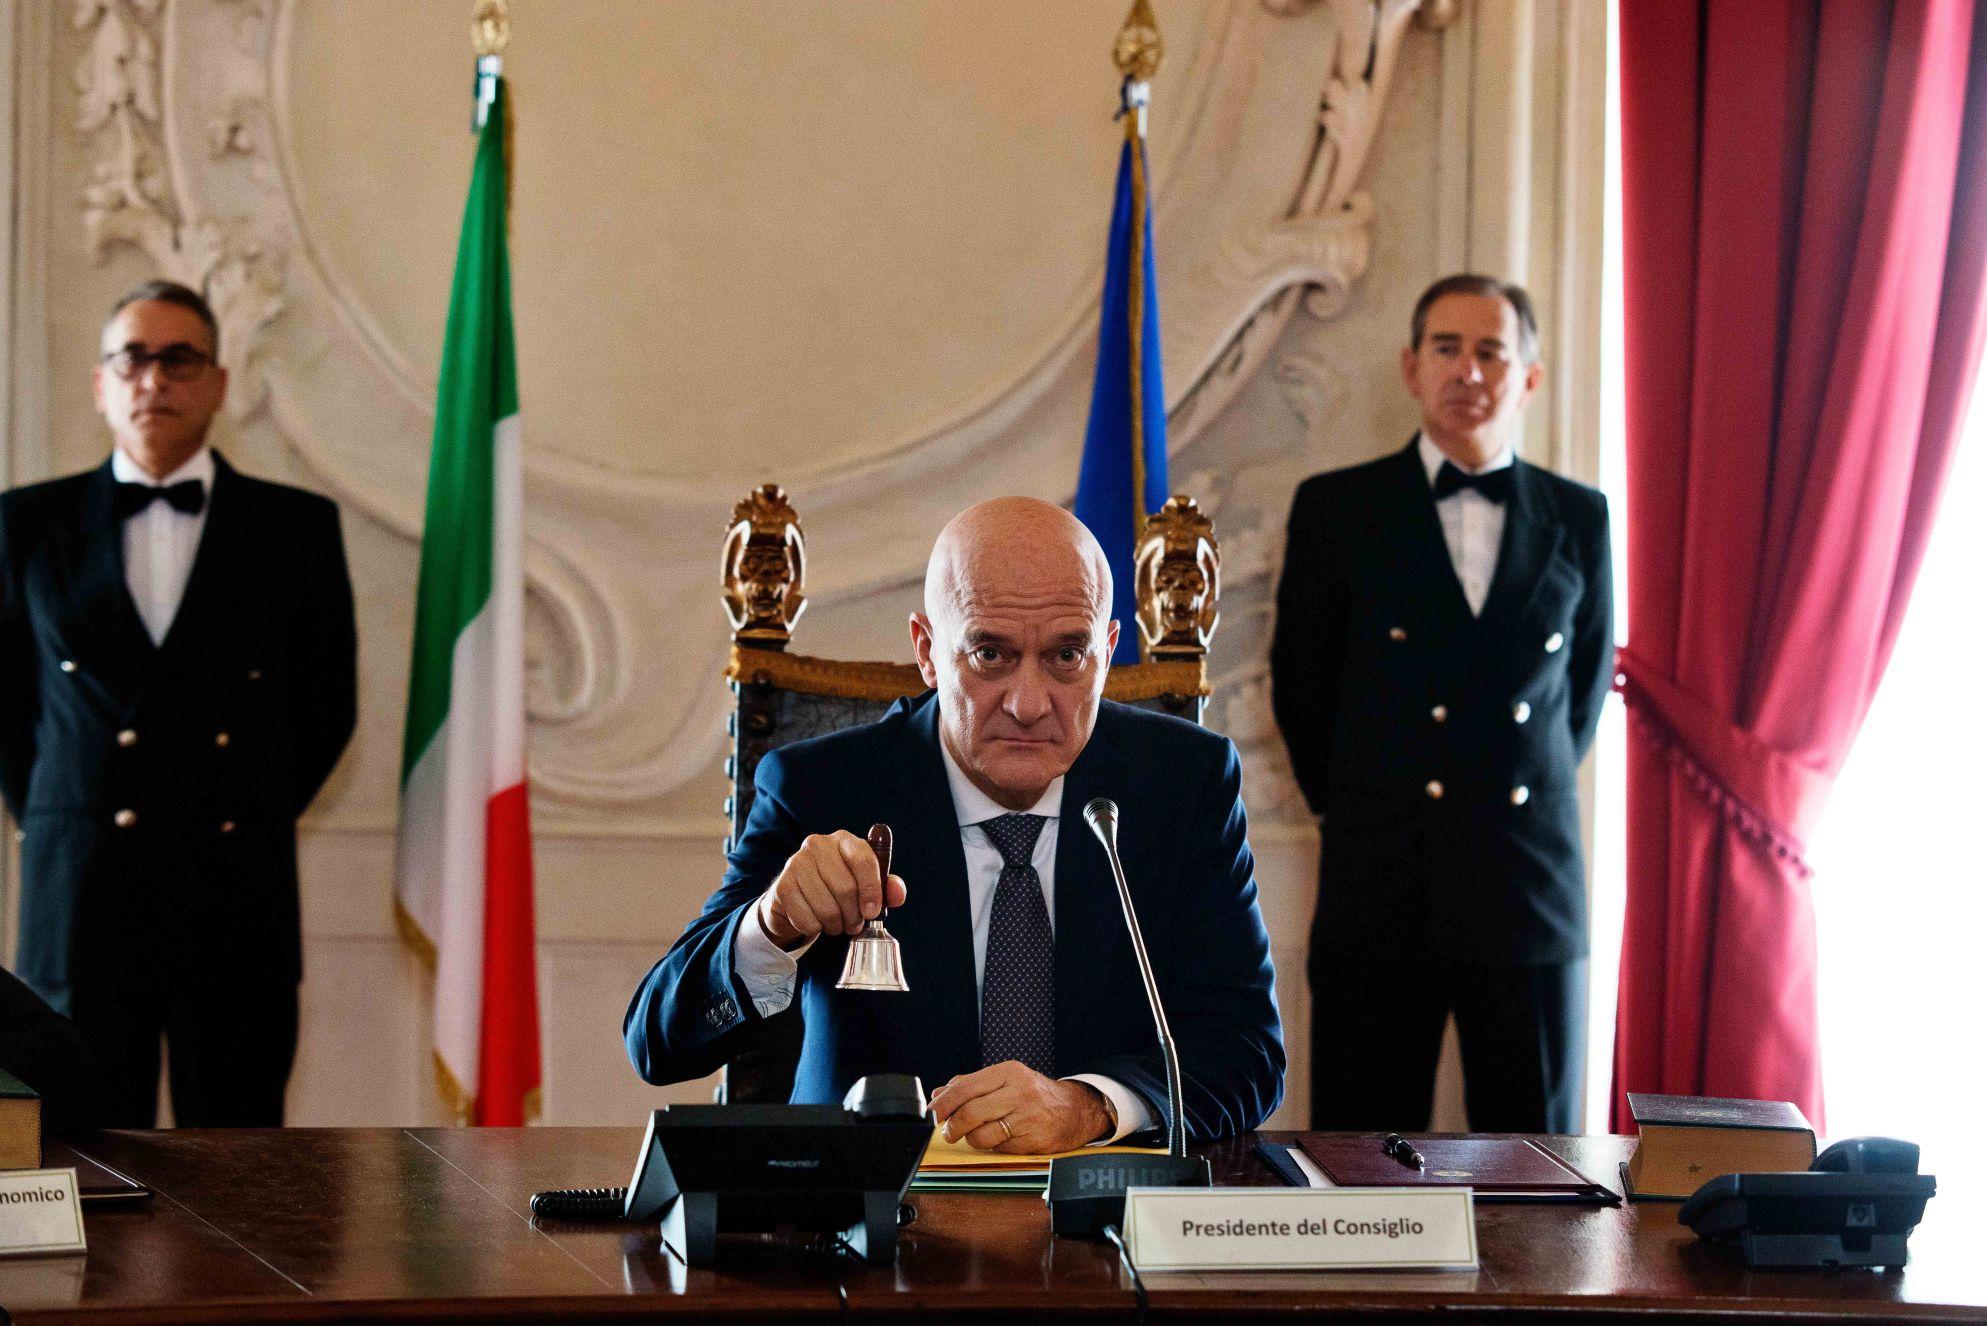 Claudio Bisio in Bentornato presidente (2019)